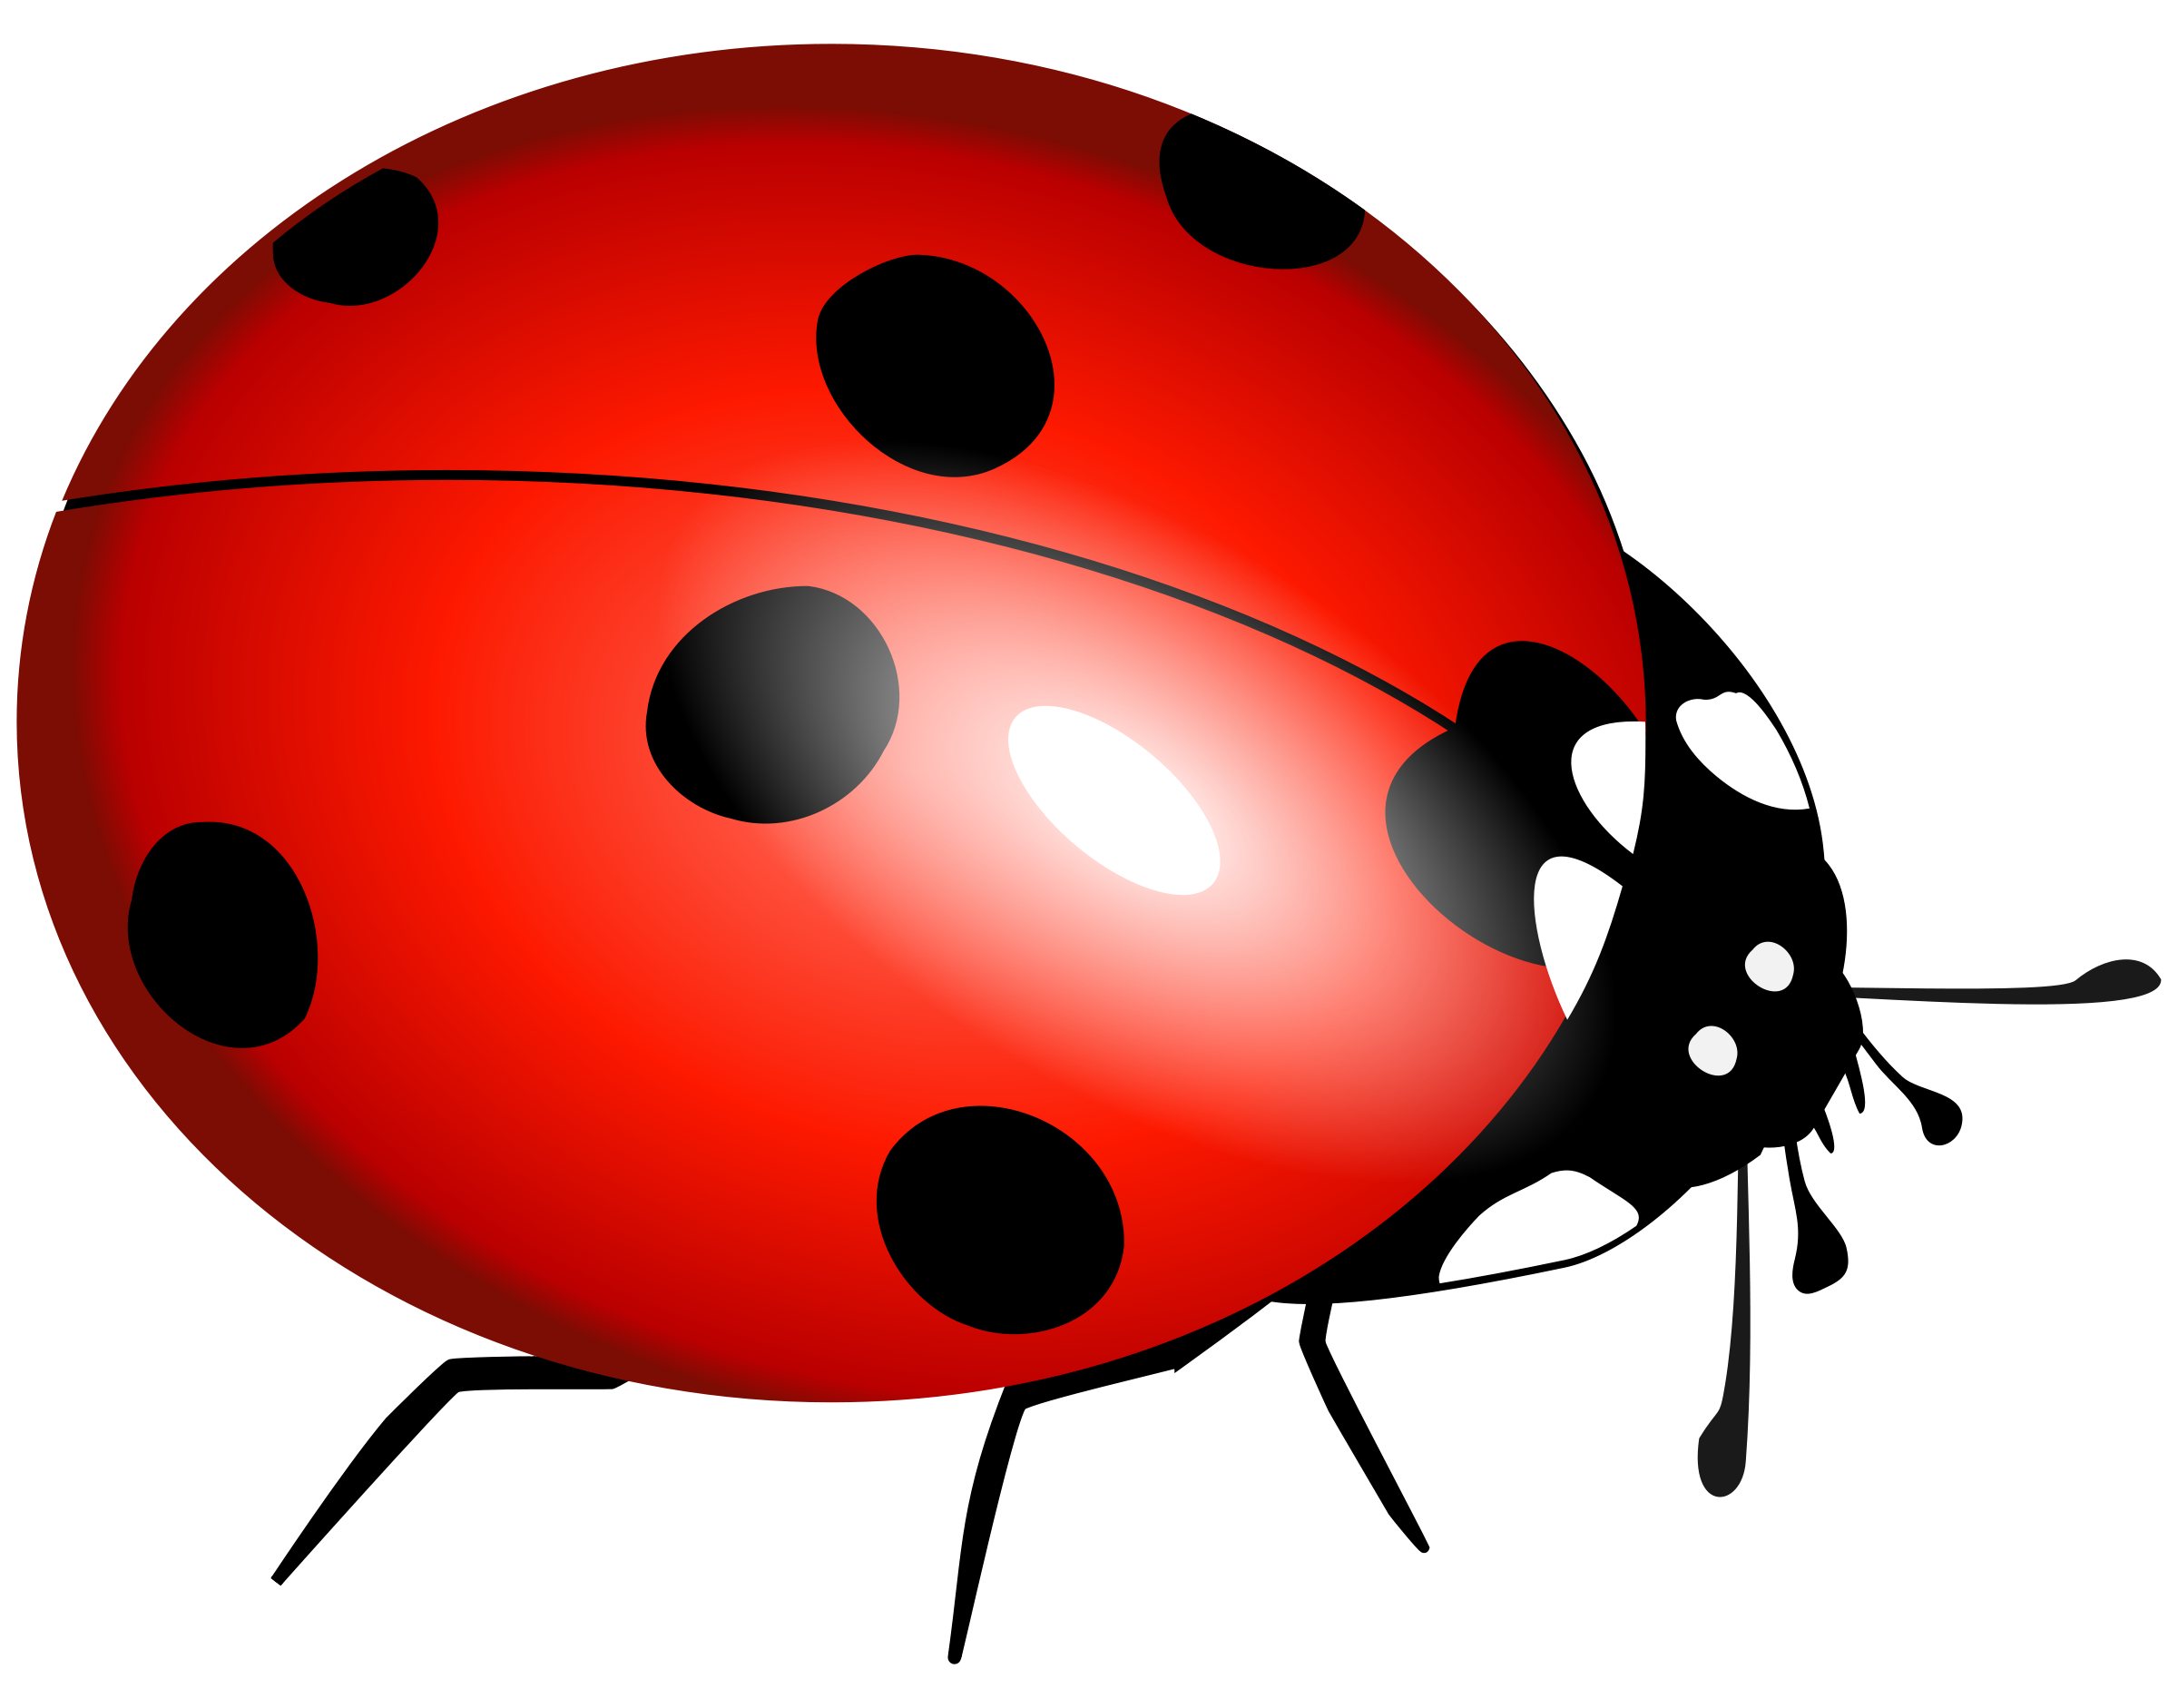 Ladybug PNG Transparent Image